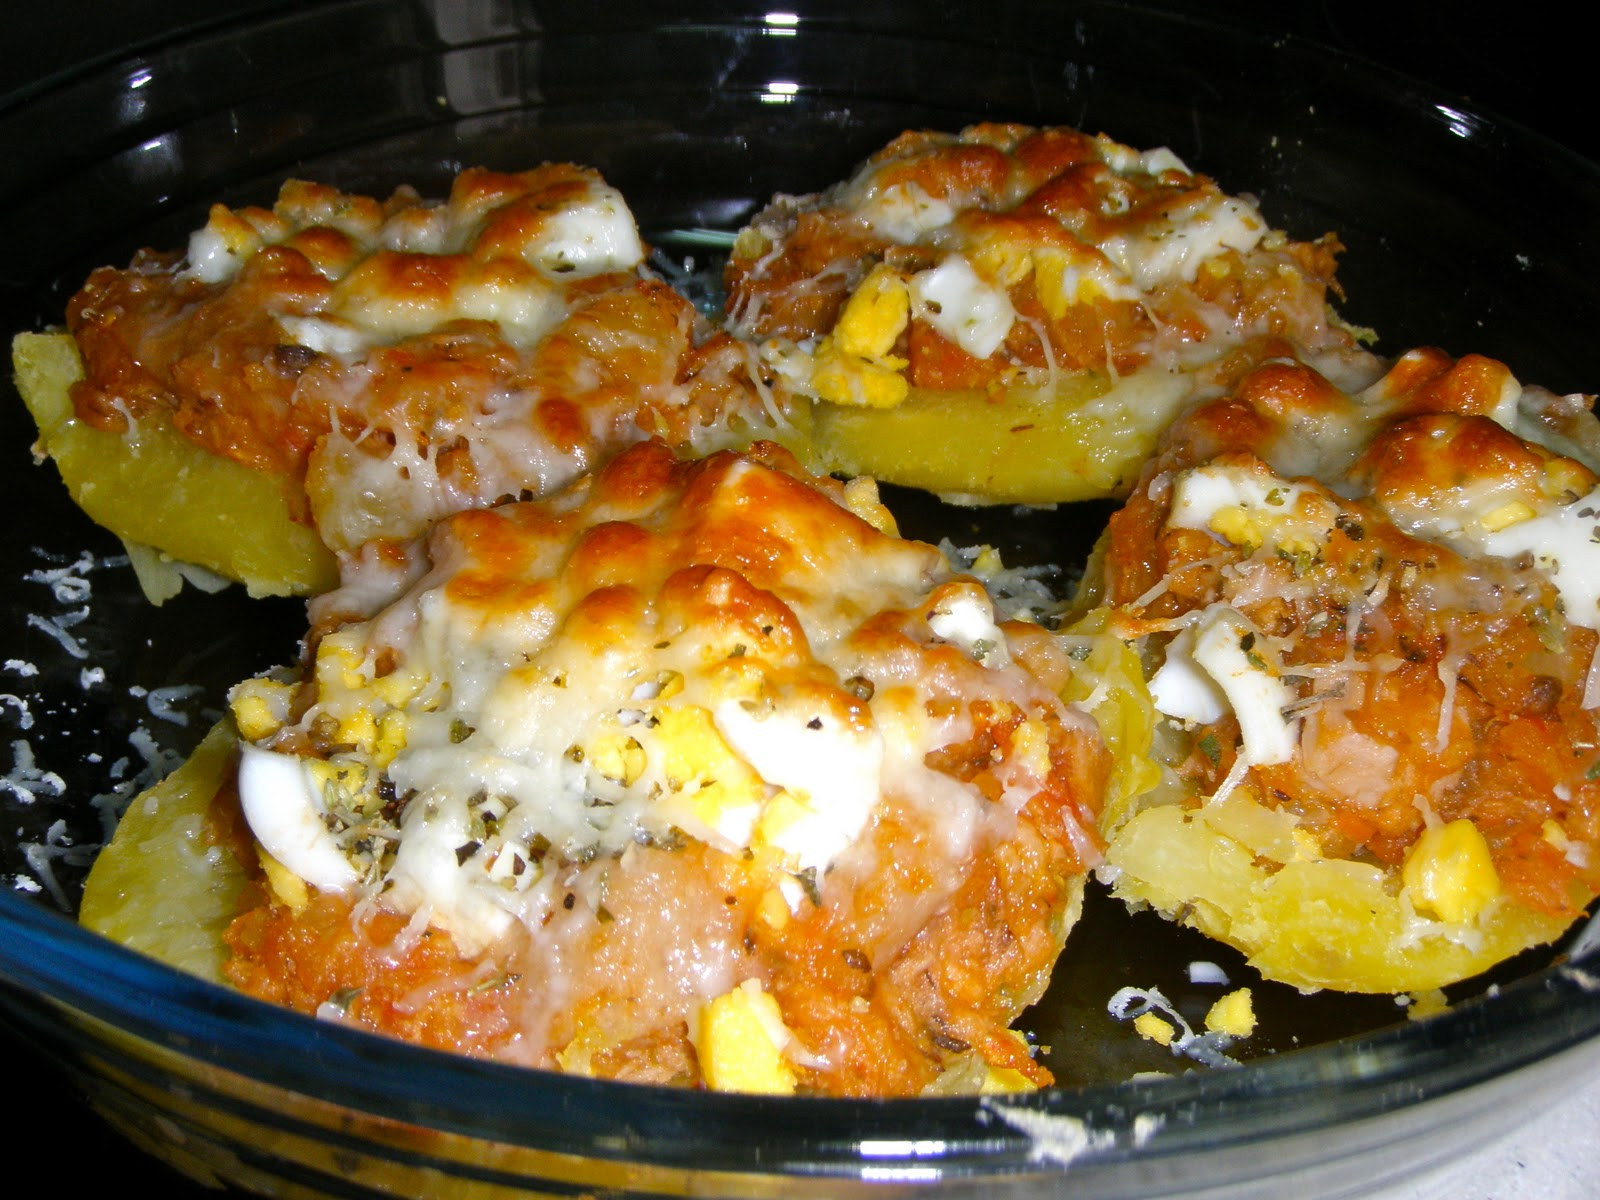 Recetas de cocina faciles para estudiantes patatas for Comidas sencillas